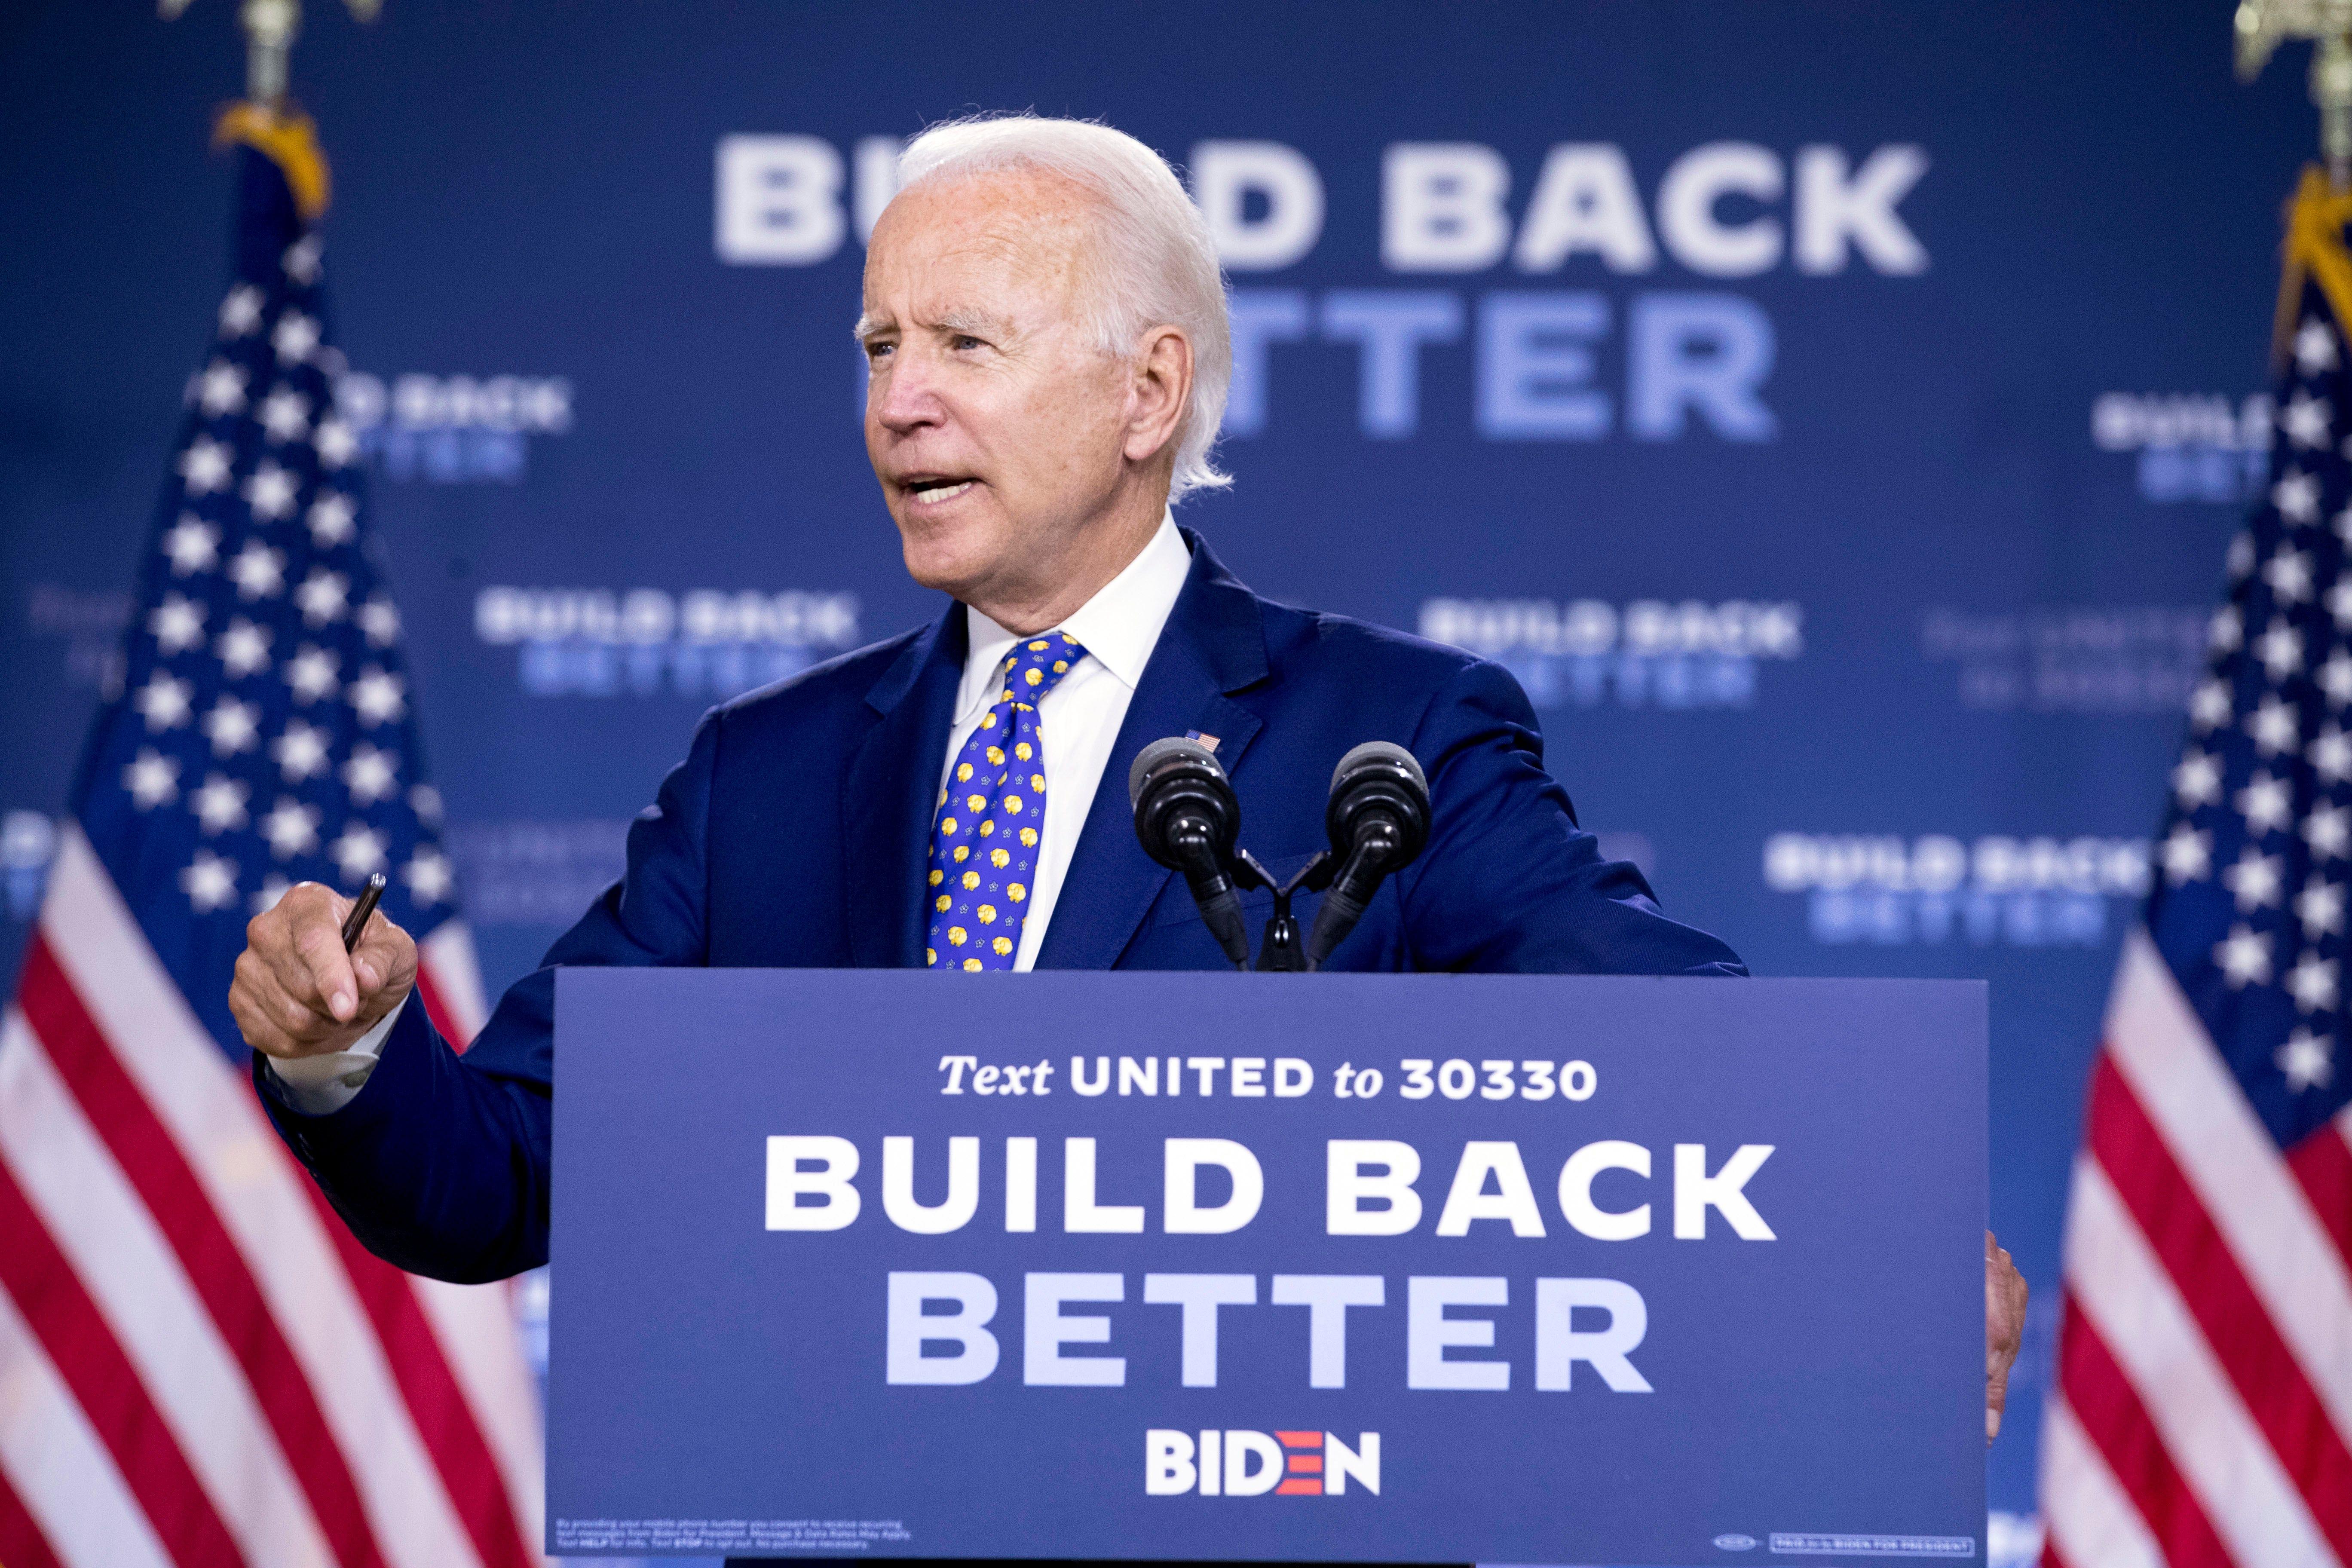 2020 election: Biden`s VP announcement comes this week